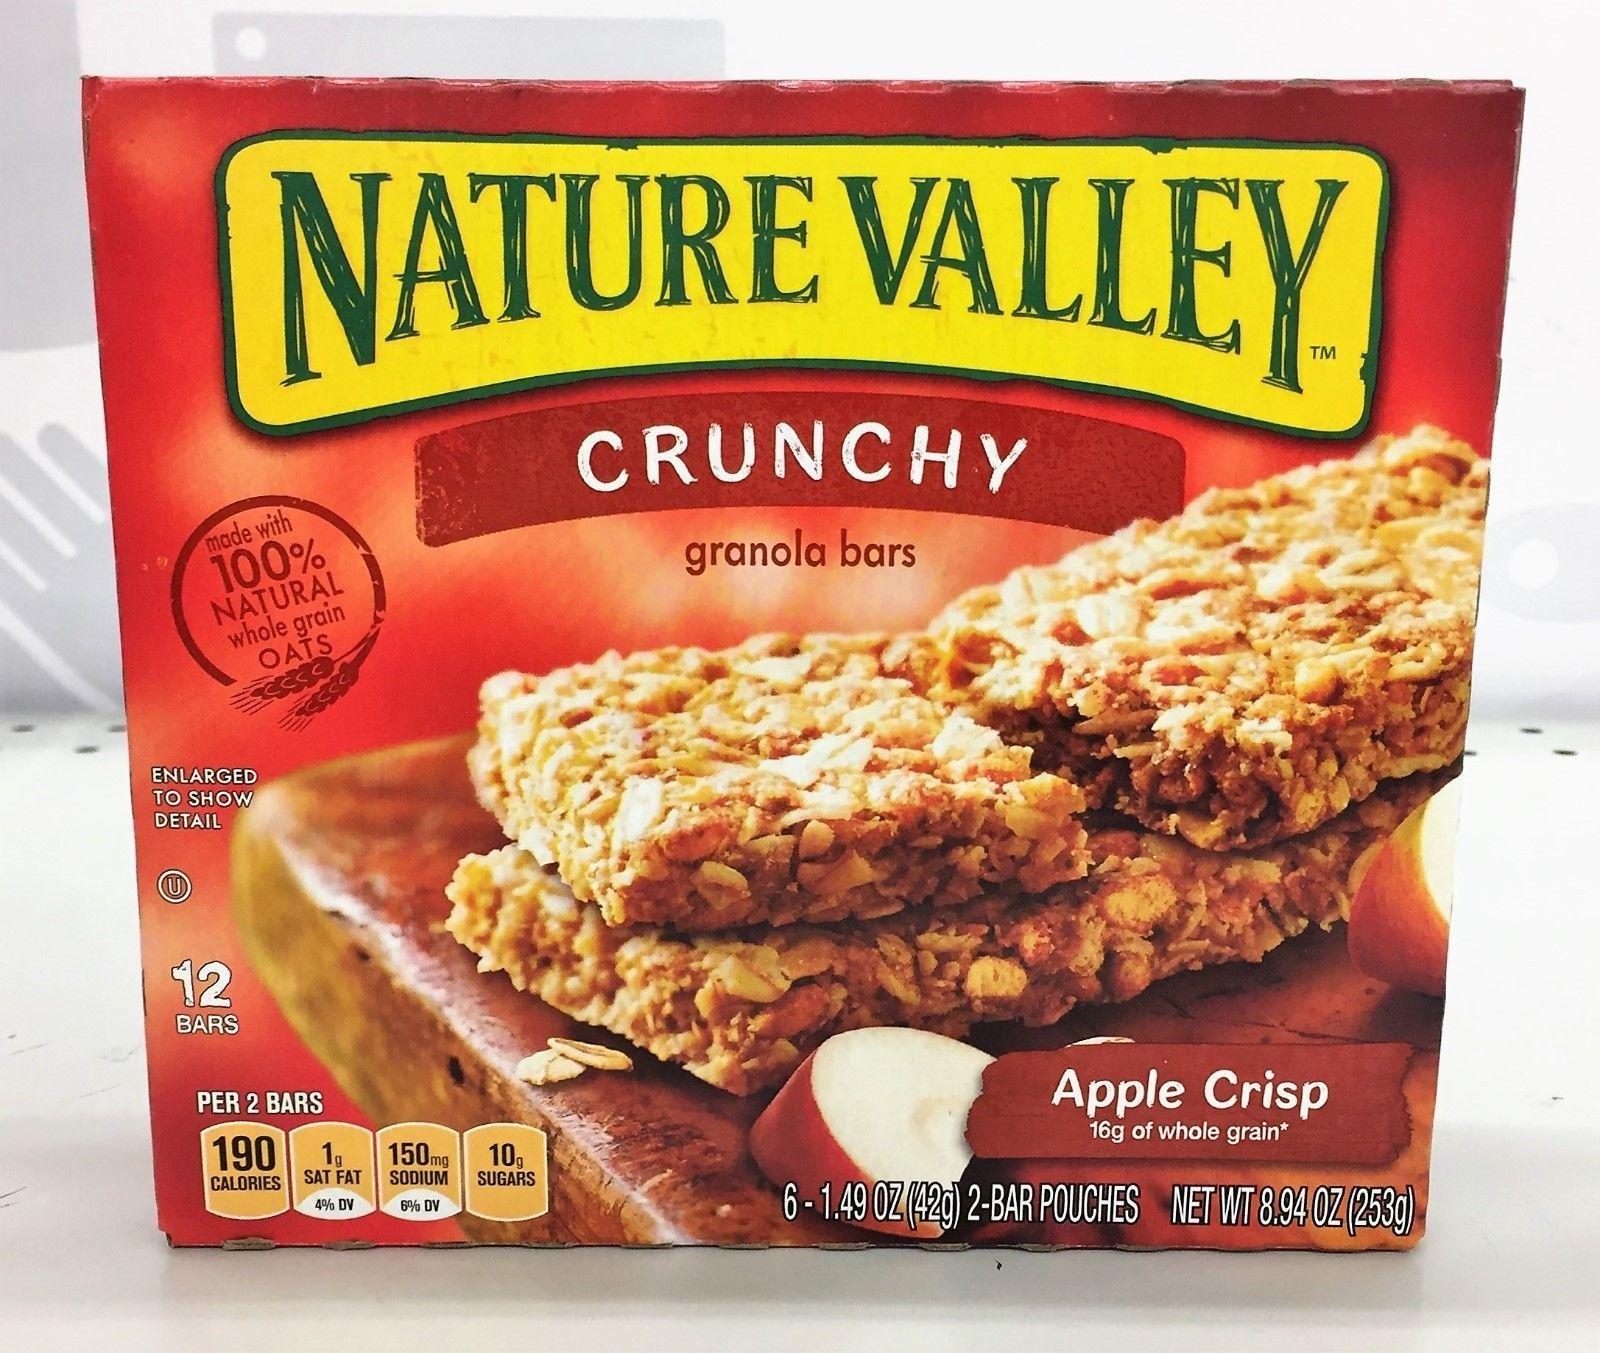 $6.49 - Nature Valley Crunchy Apple Crisp Granola Bars 8.94 Oz #ebay #Home & Garden   Crunchy Granola, Roasted Almonds, Granola